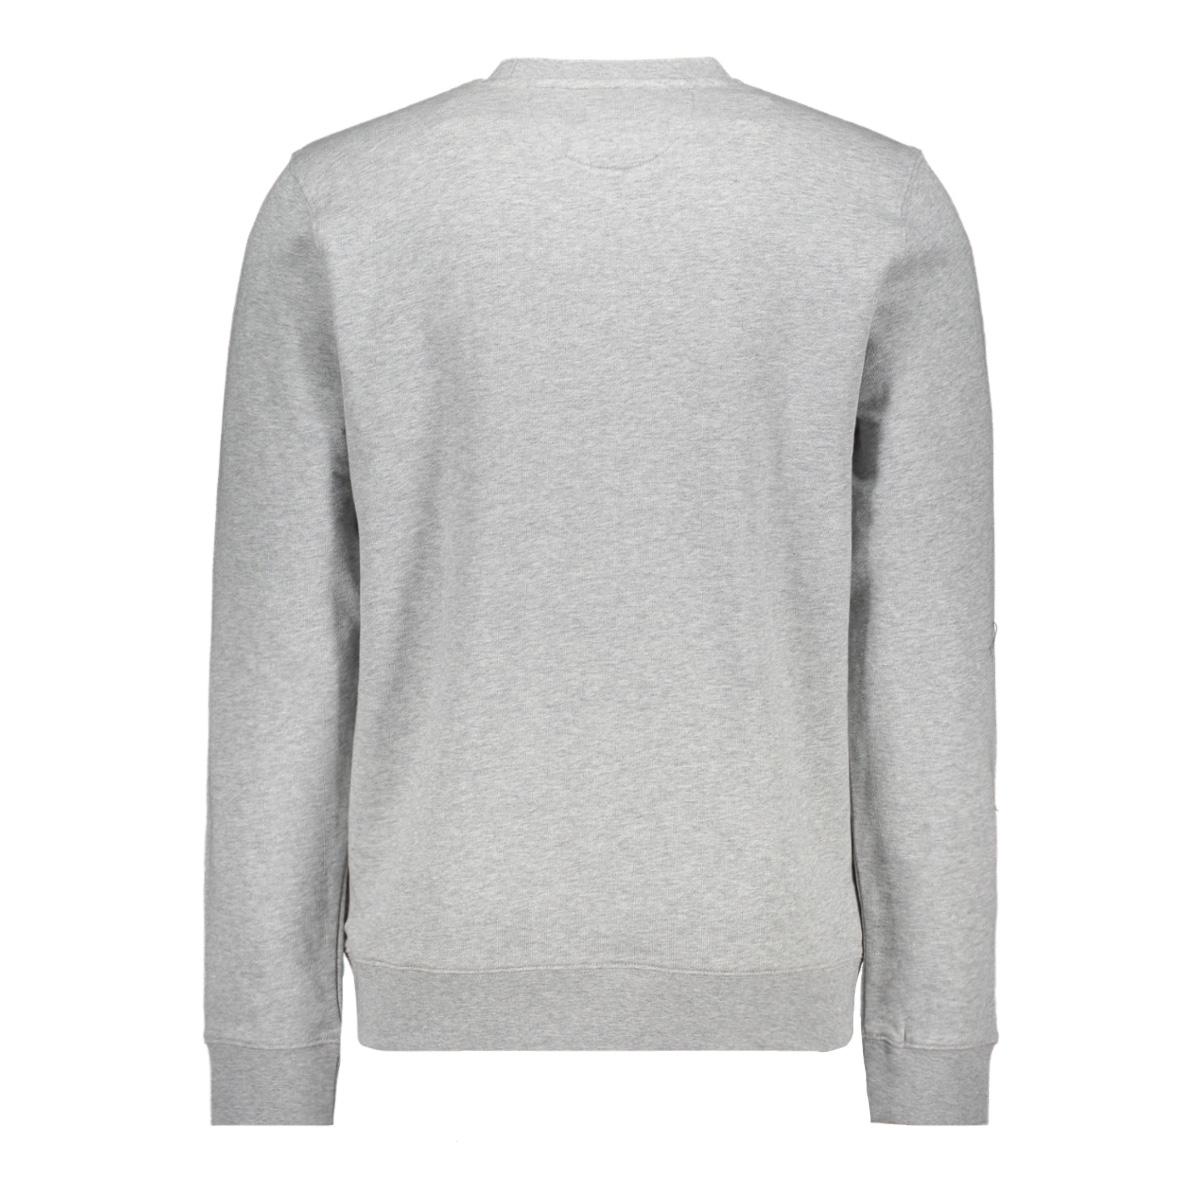 waharoa 20an310 nza sweater 70 grey melange